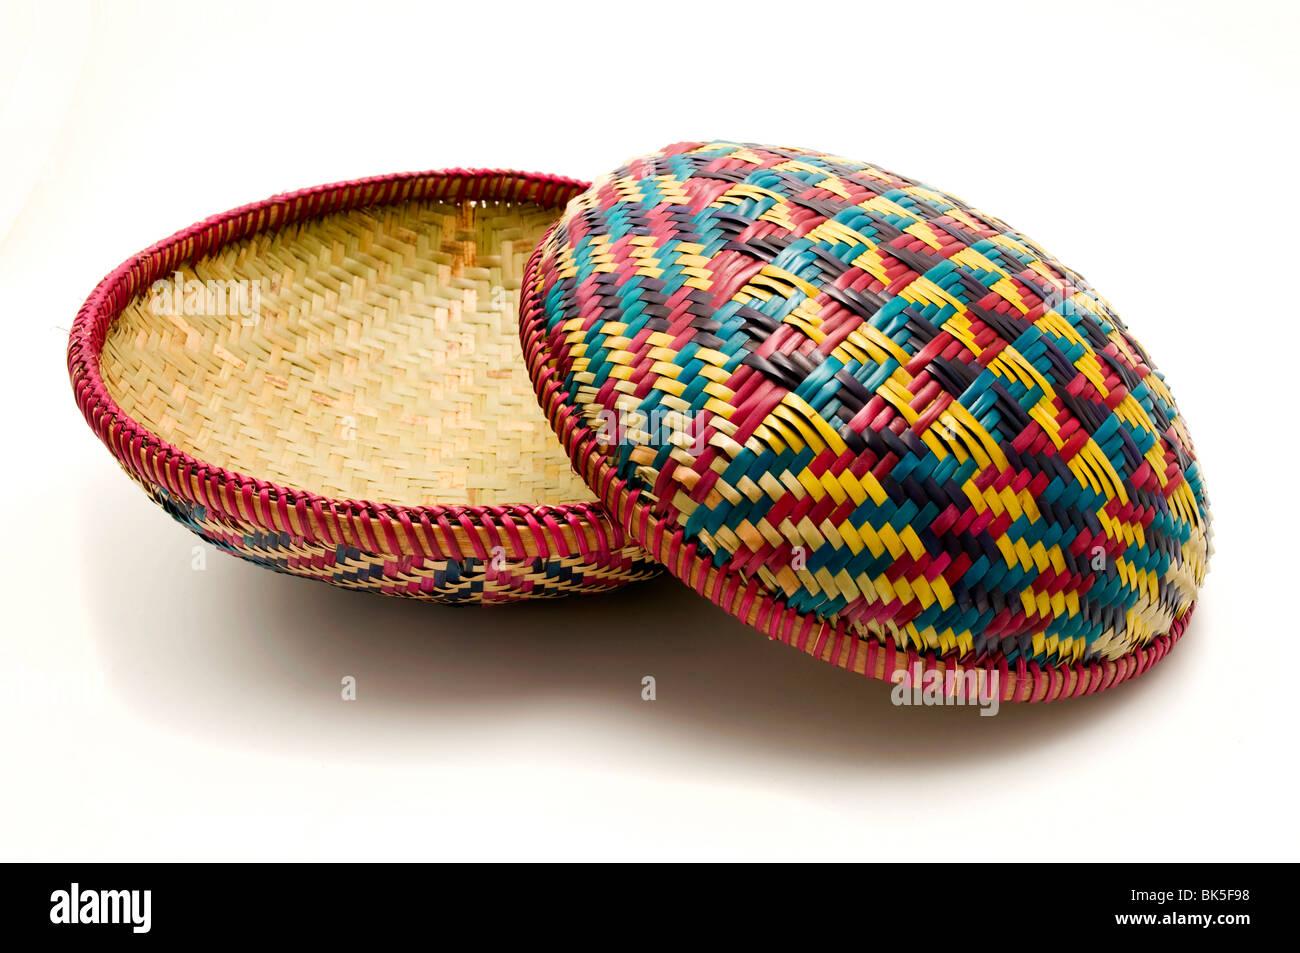 Bhutanese handmade basket - Stock Image